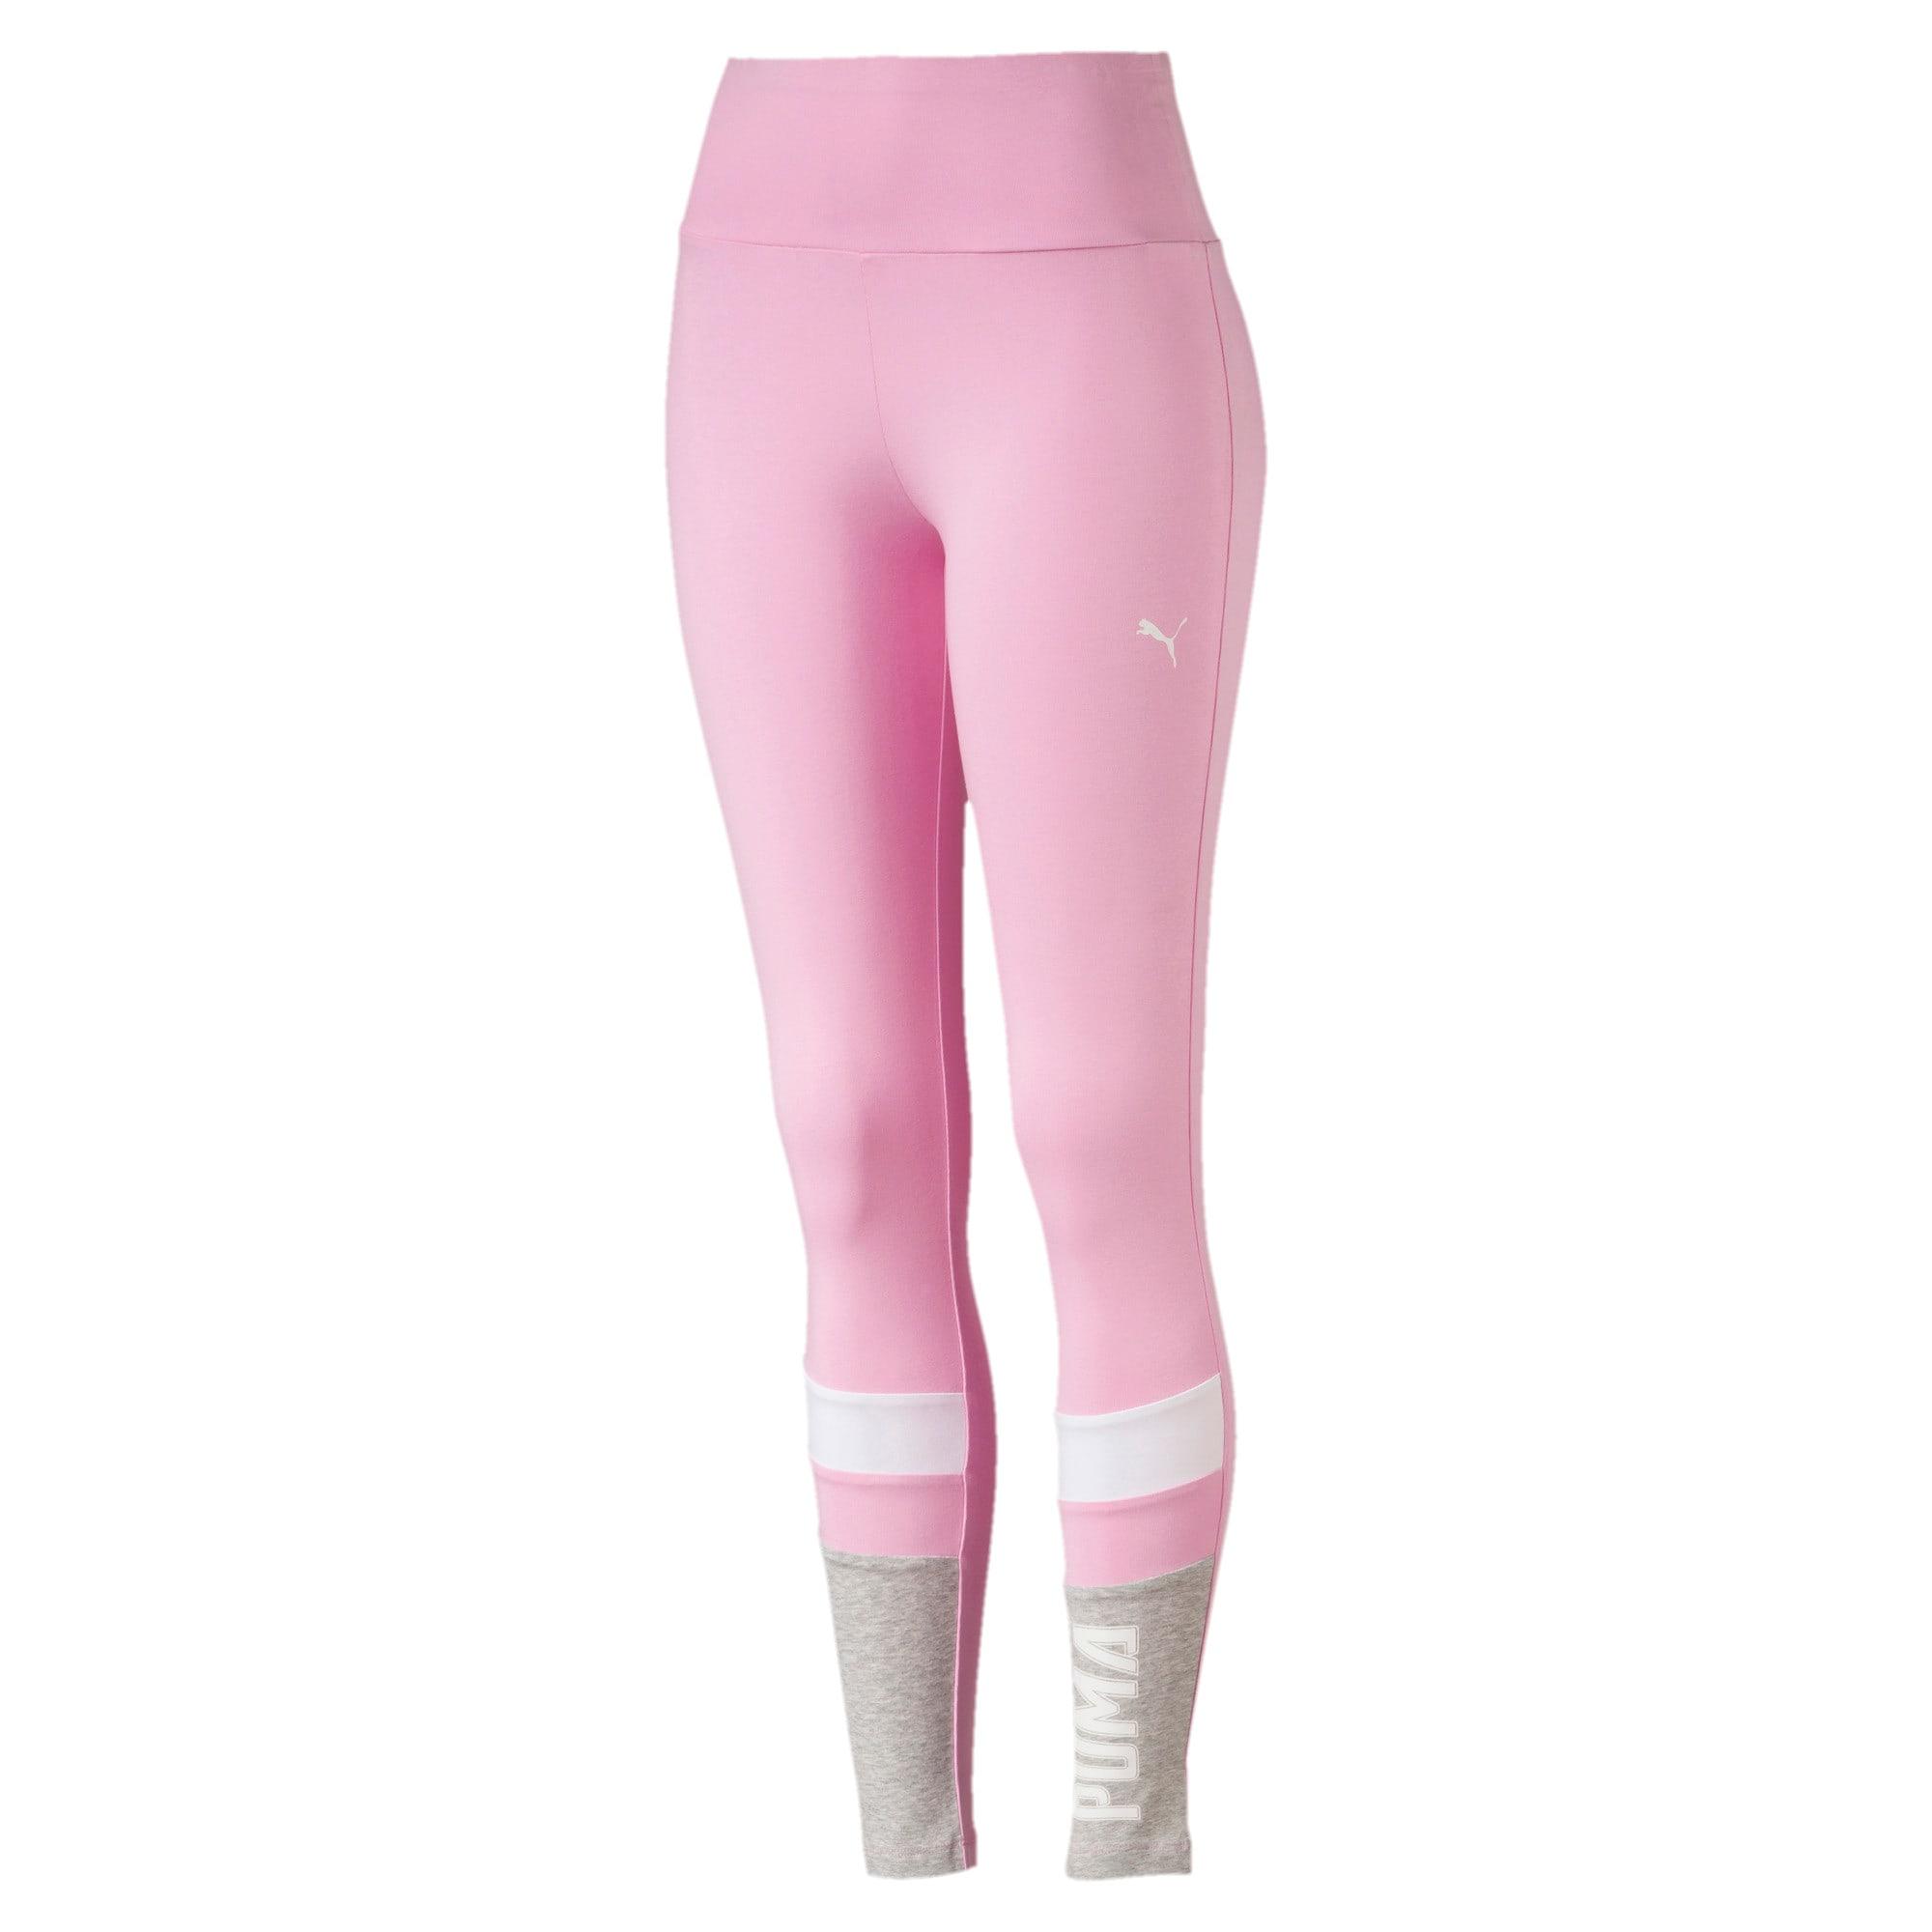 Thumbnail 1 of Athletics Graphic Women's Leggings, Pale Pink, medium